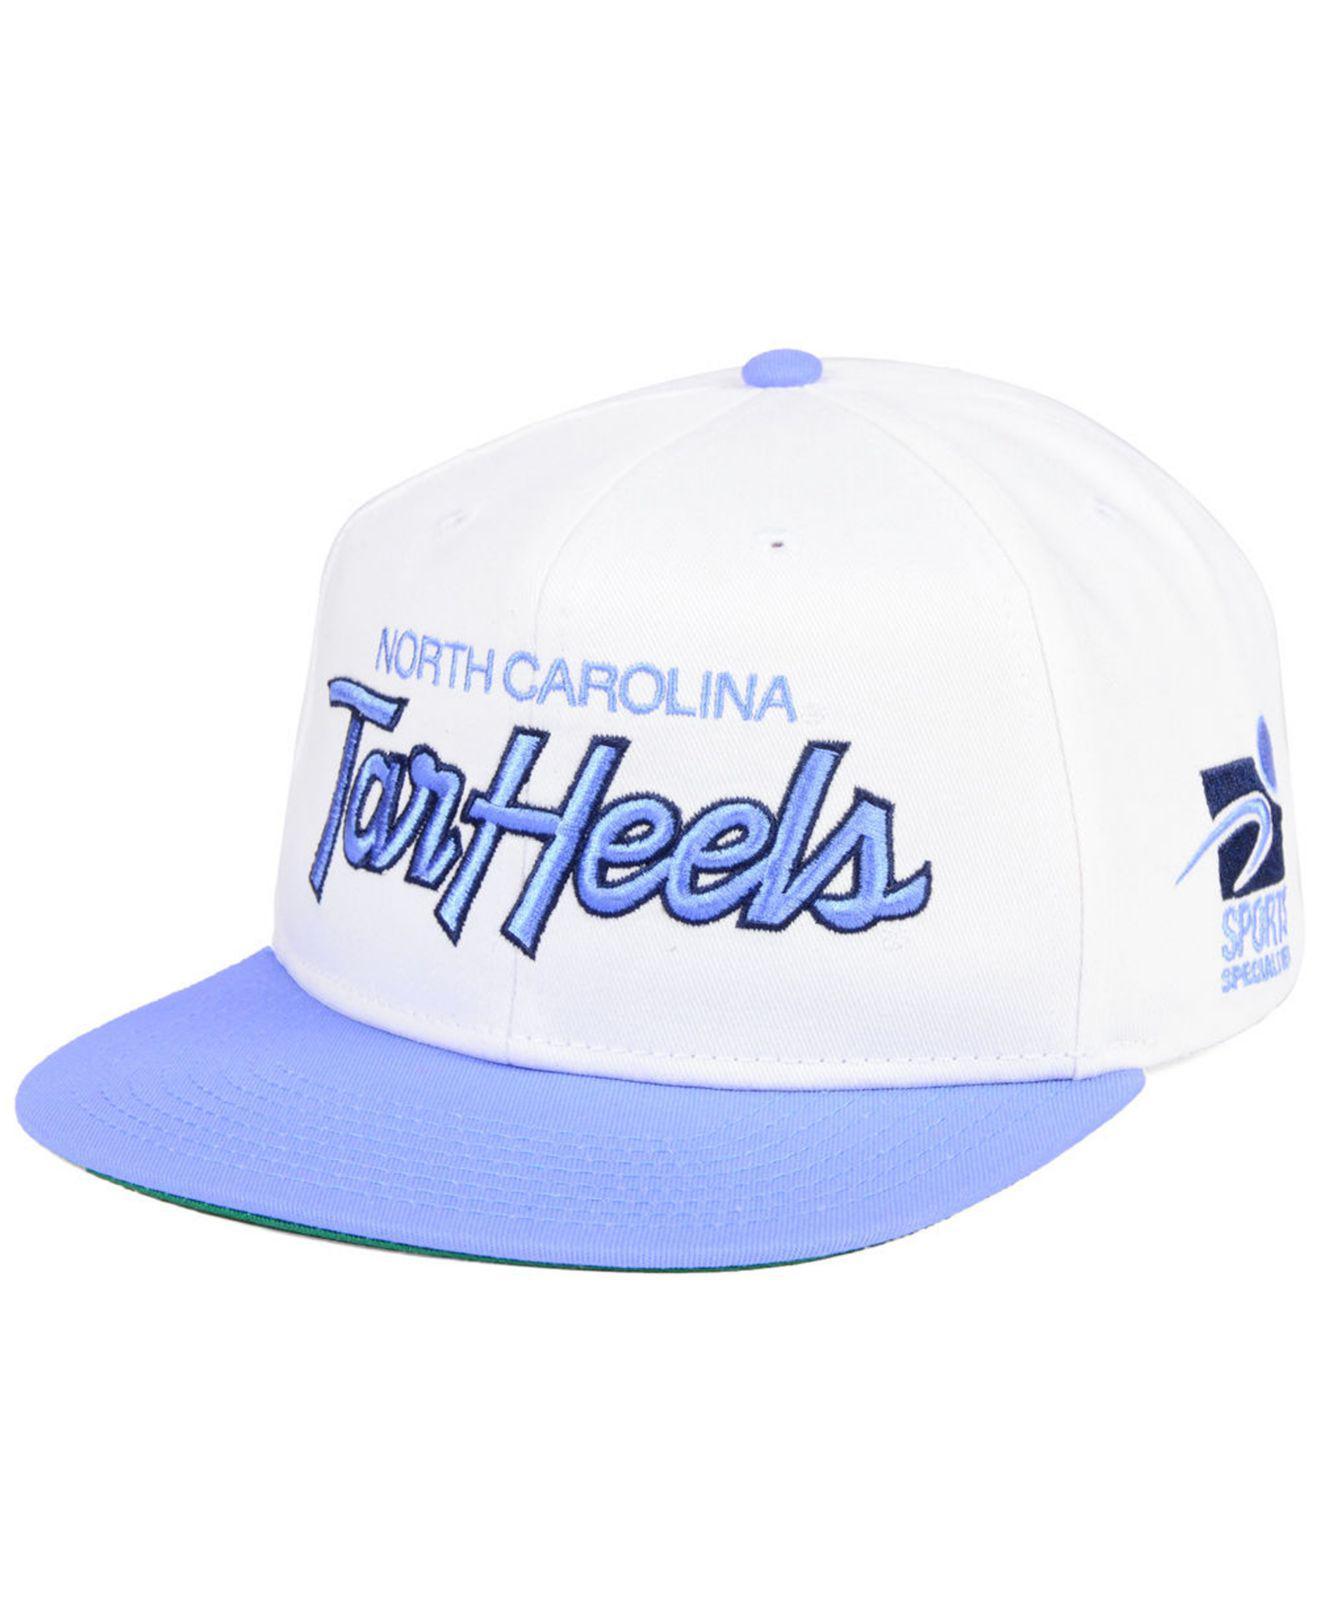 online retailer 6f6b0 16d91 Nike North Carolina Tar Heels Sport Specialties Snapback Cap in ...